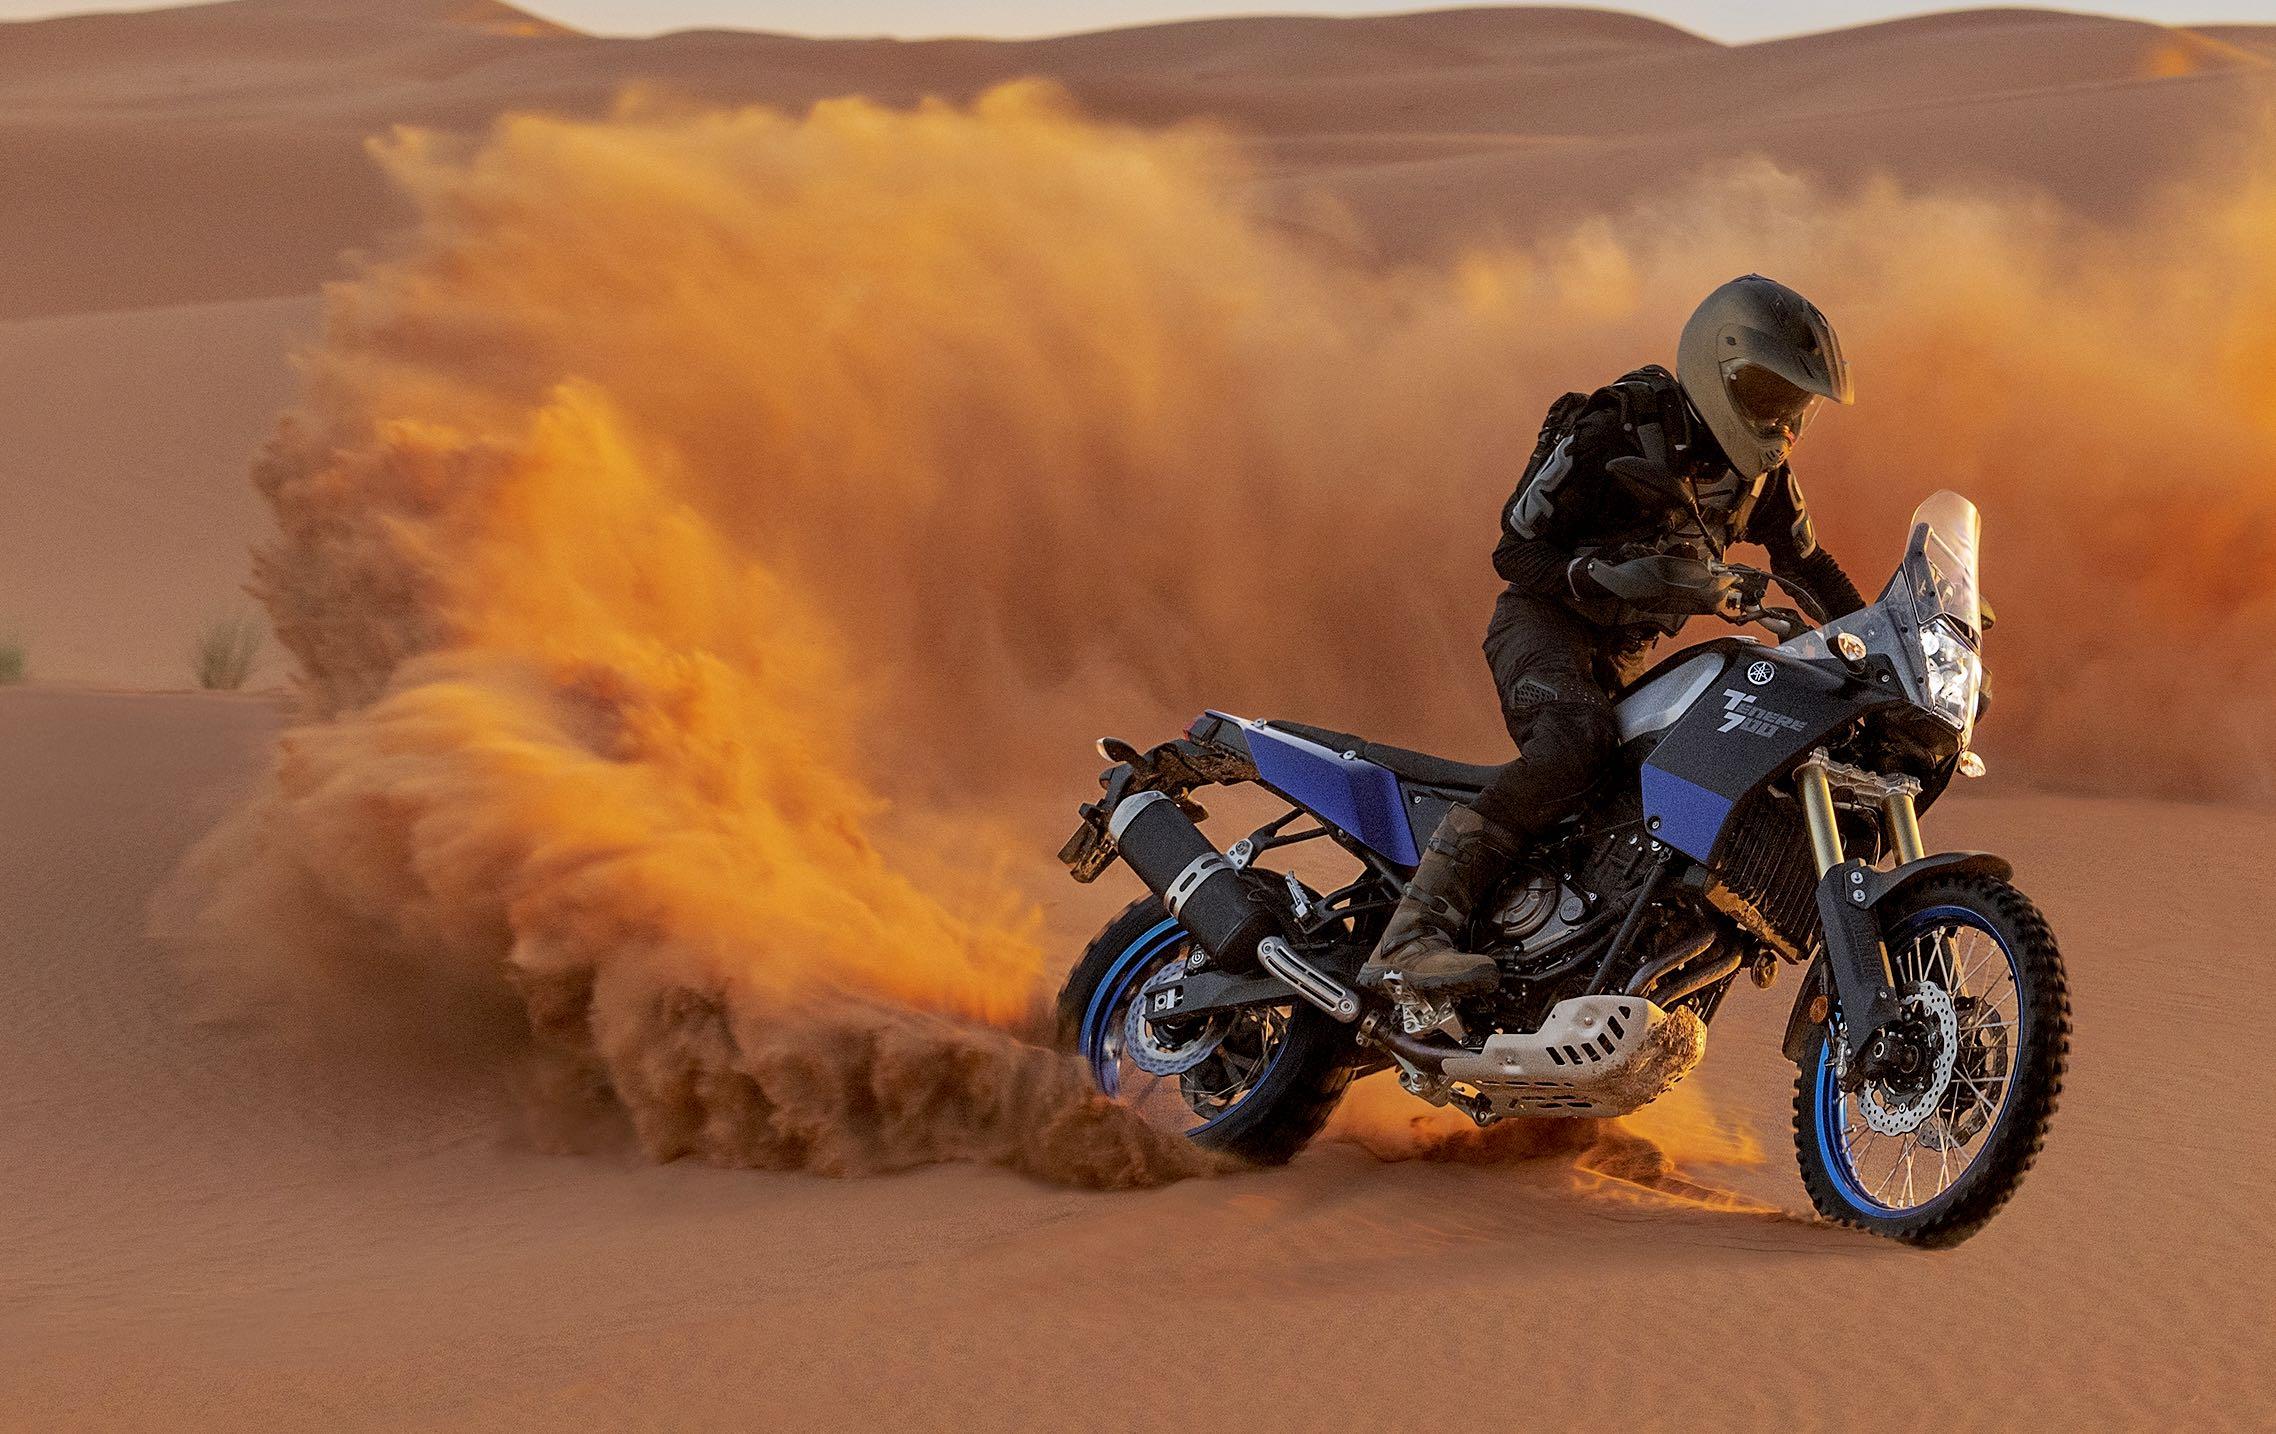 Yamaha Ténéré 700, Yamaha se pone seria con su trail de media cilindrada